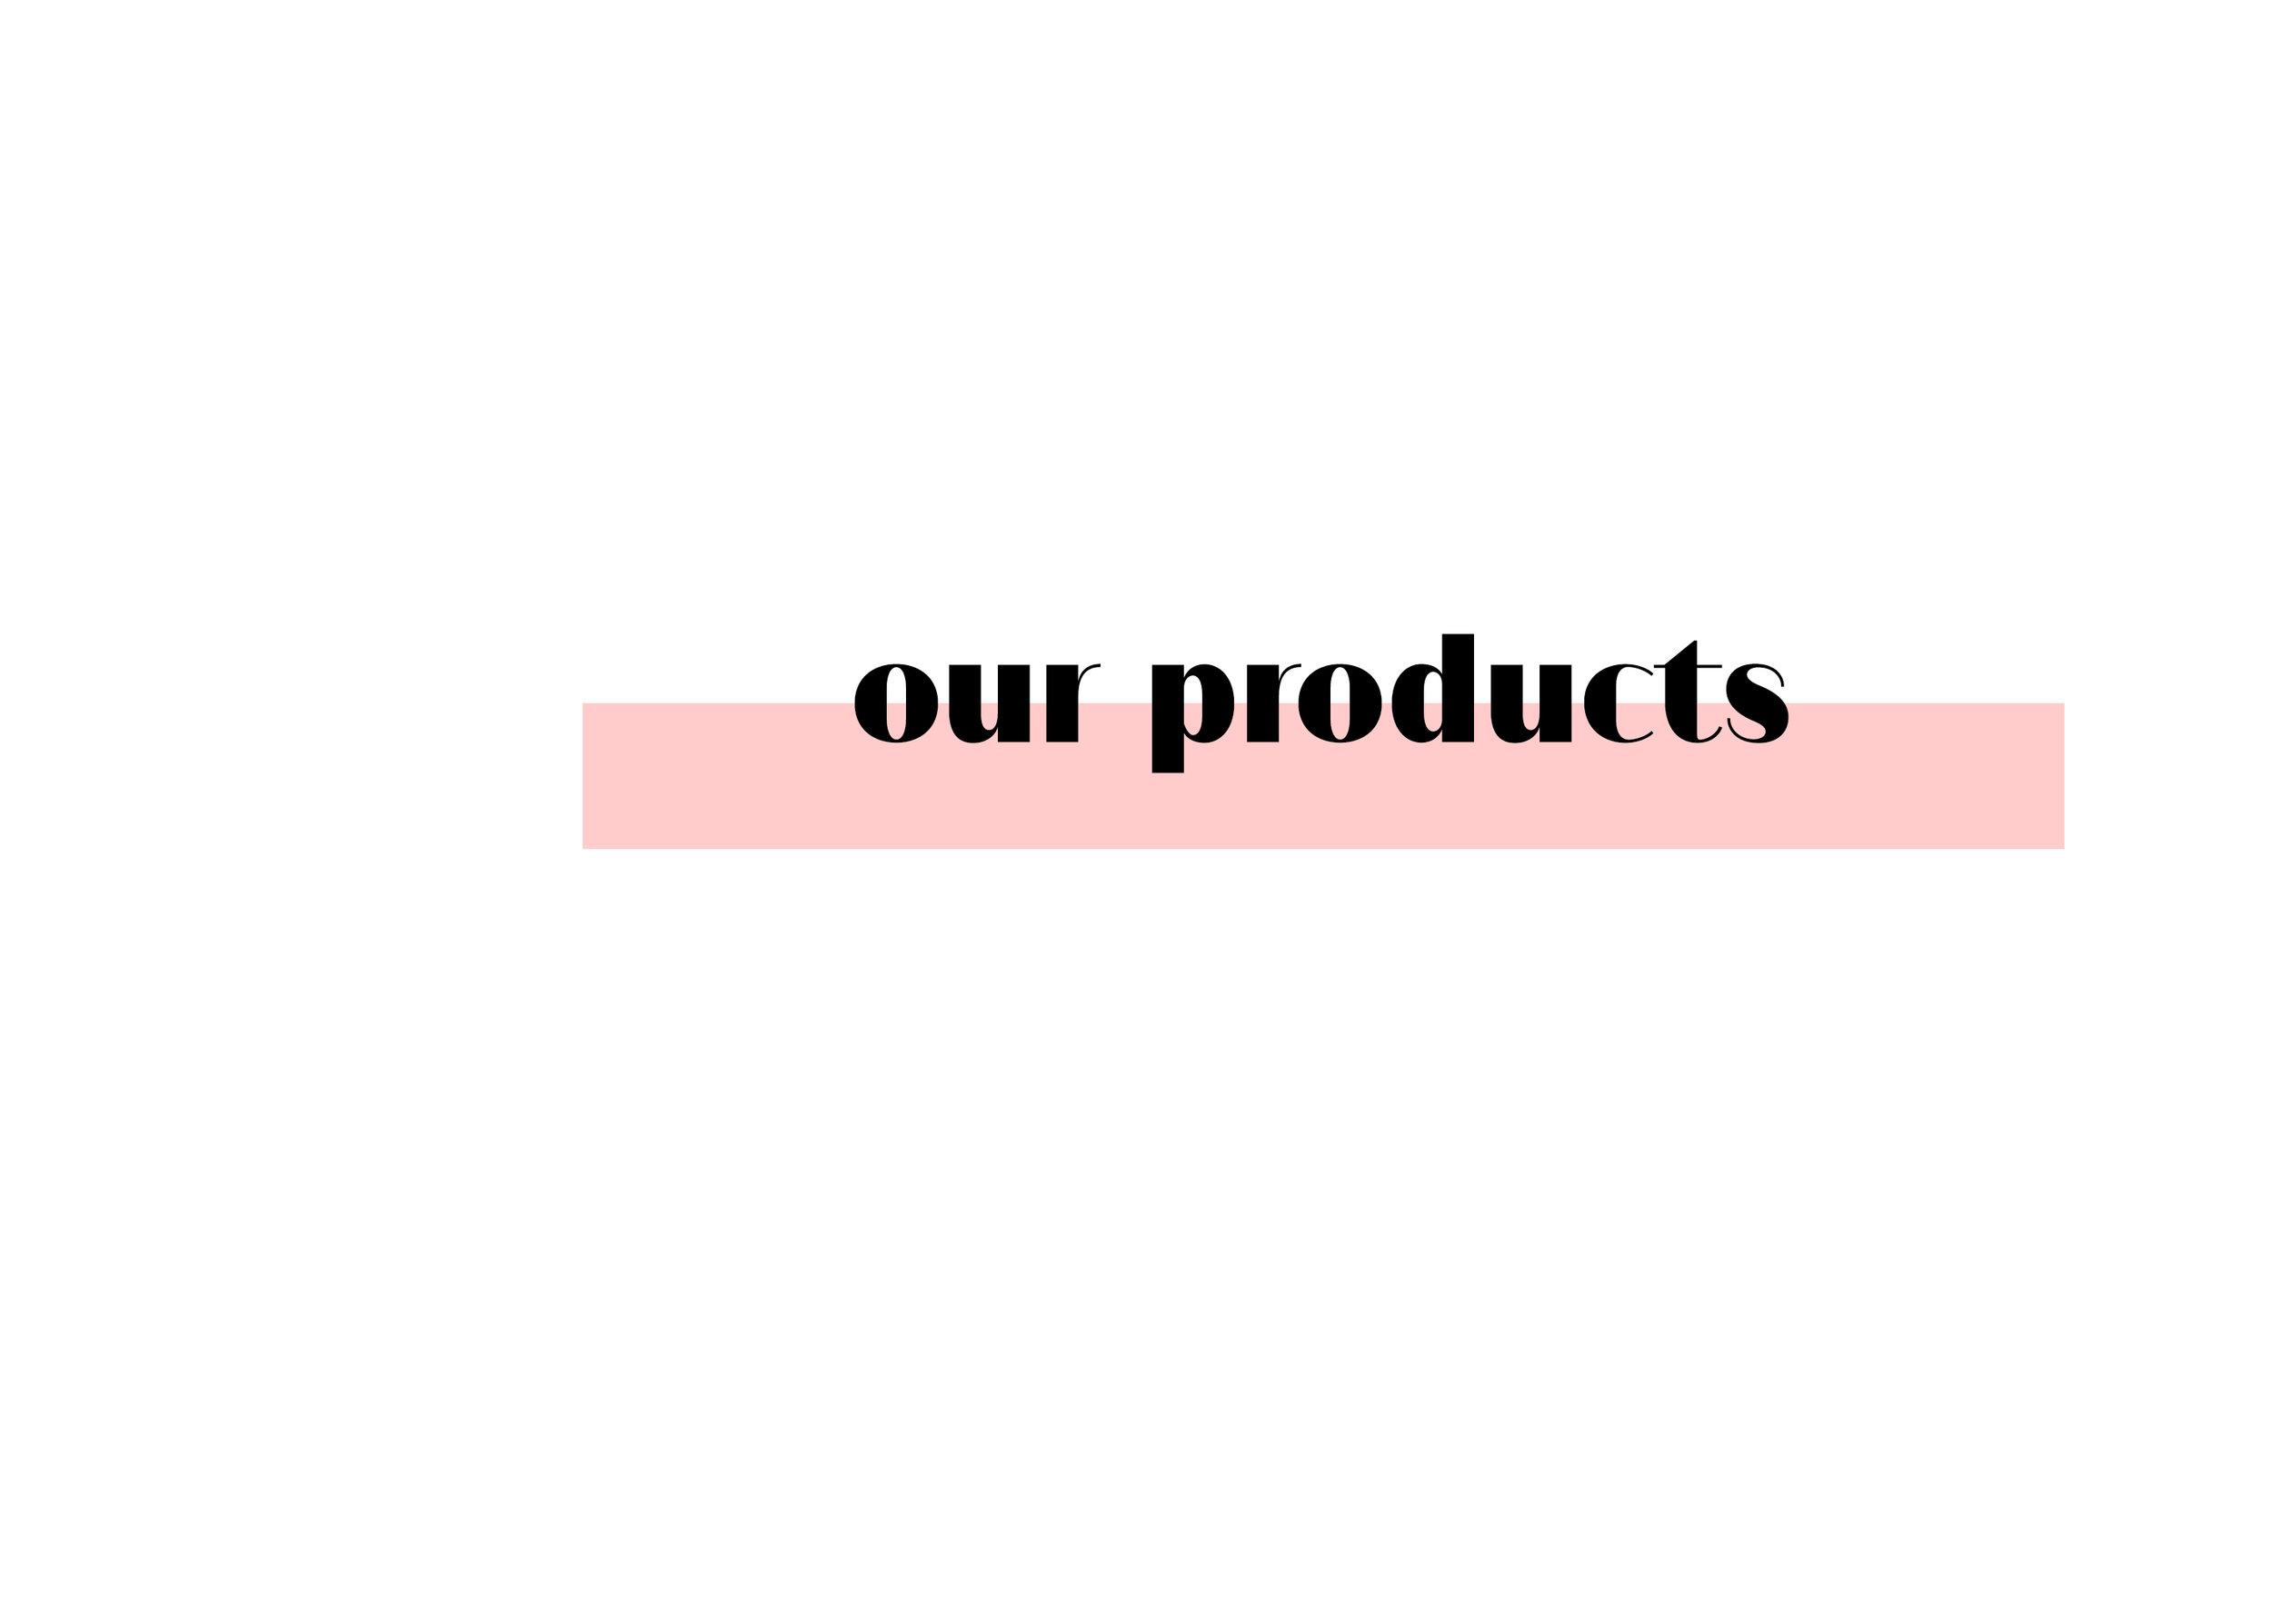 Ari&Blair_wordproducts.jpg